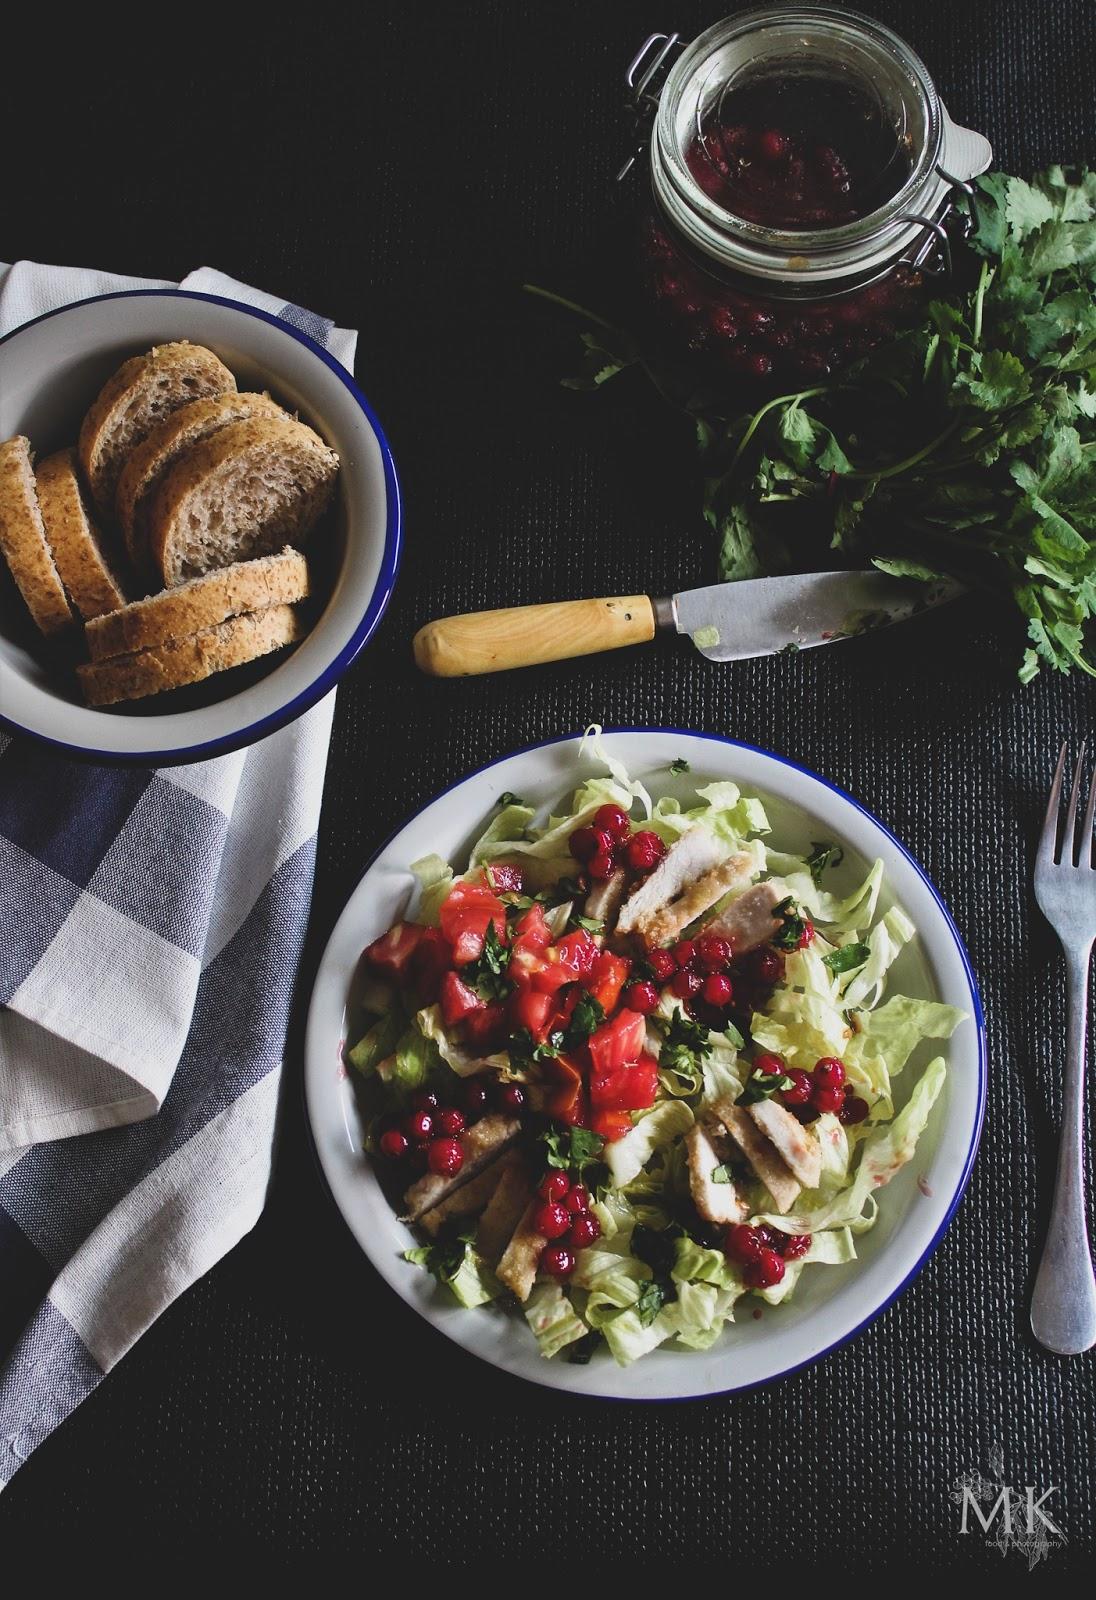 ensalada-sueca-pollo-grosellas